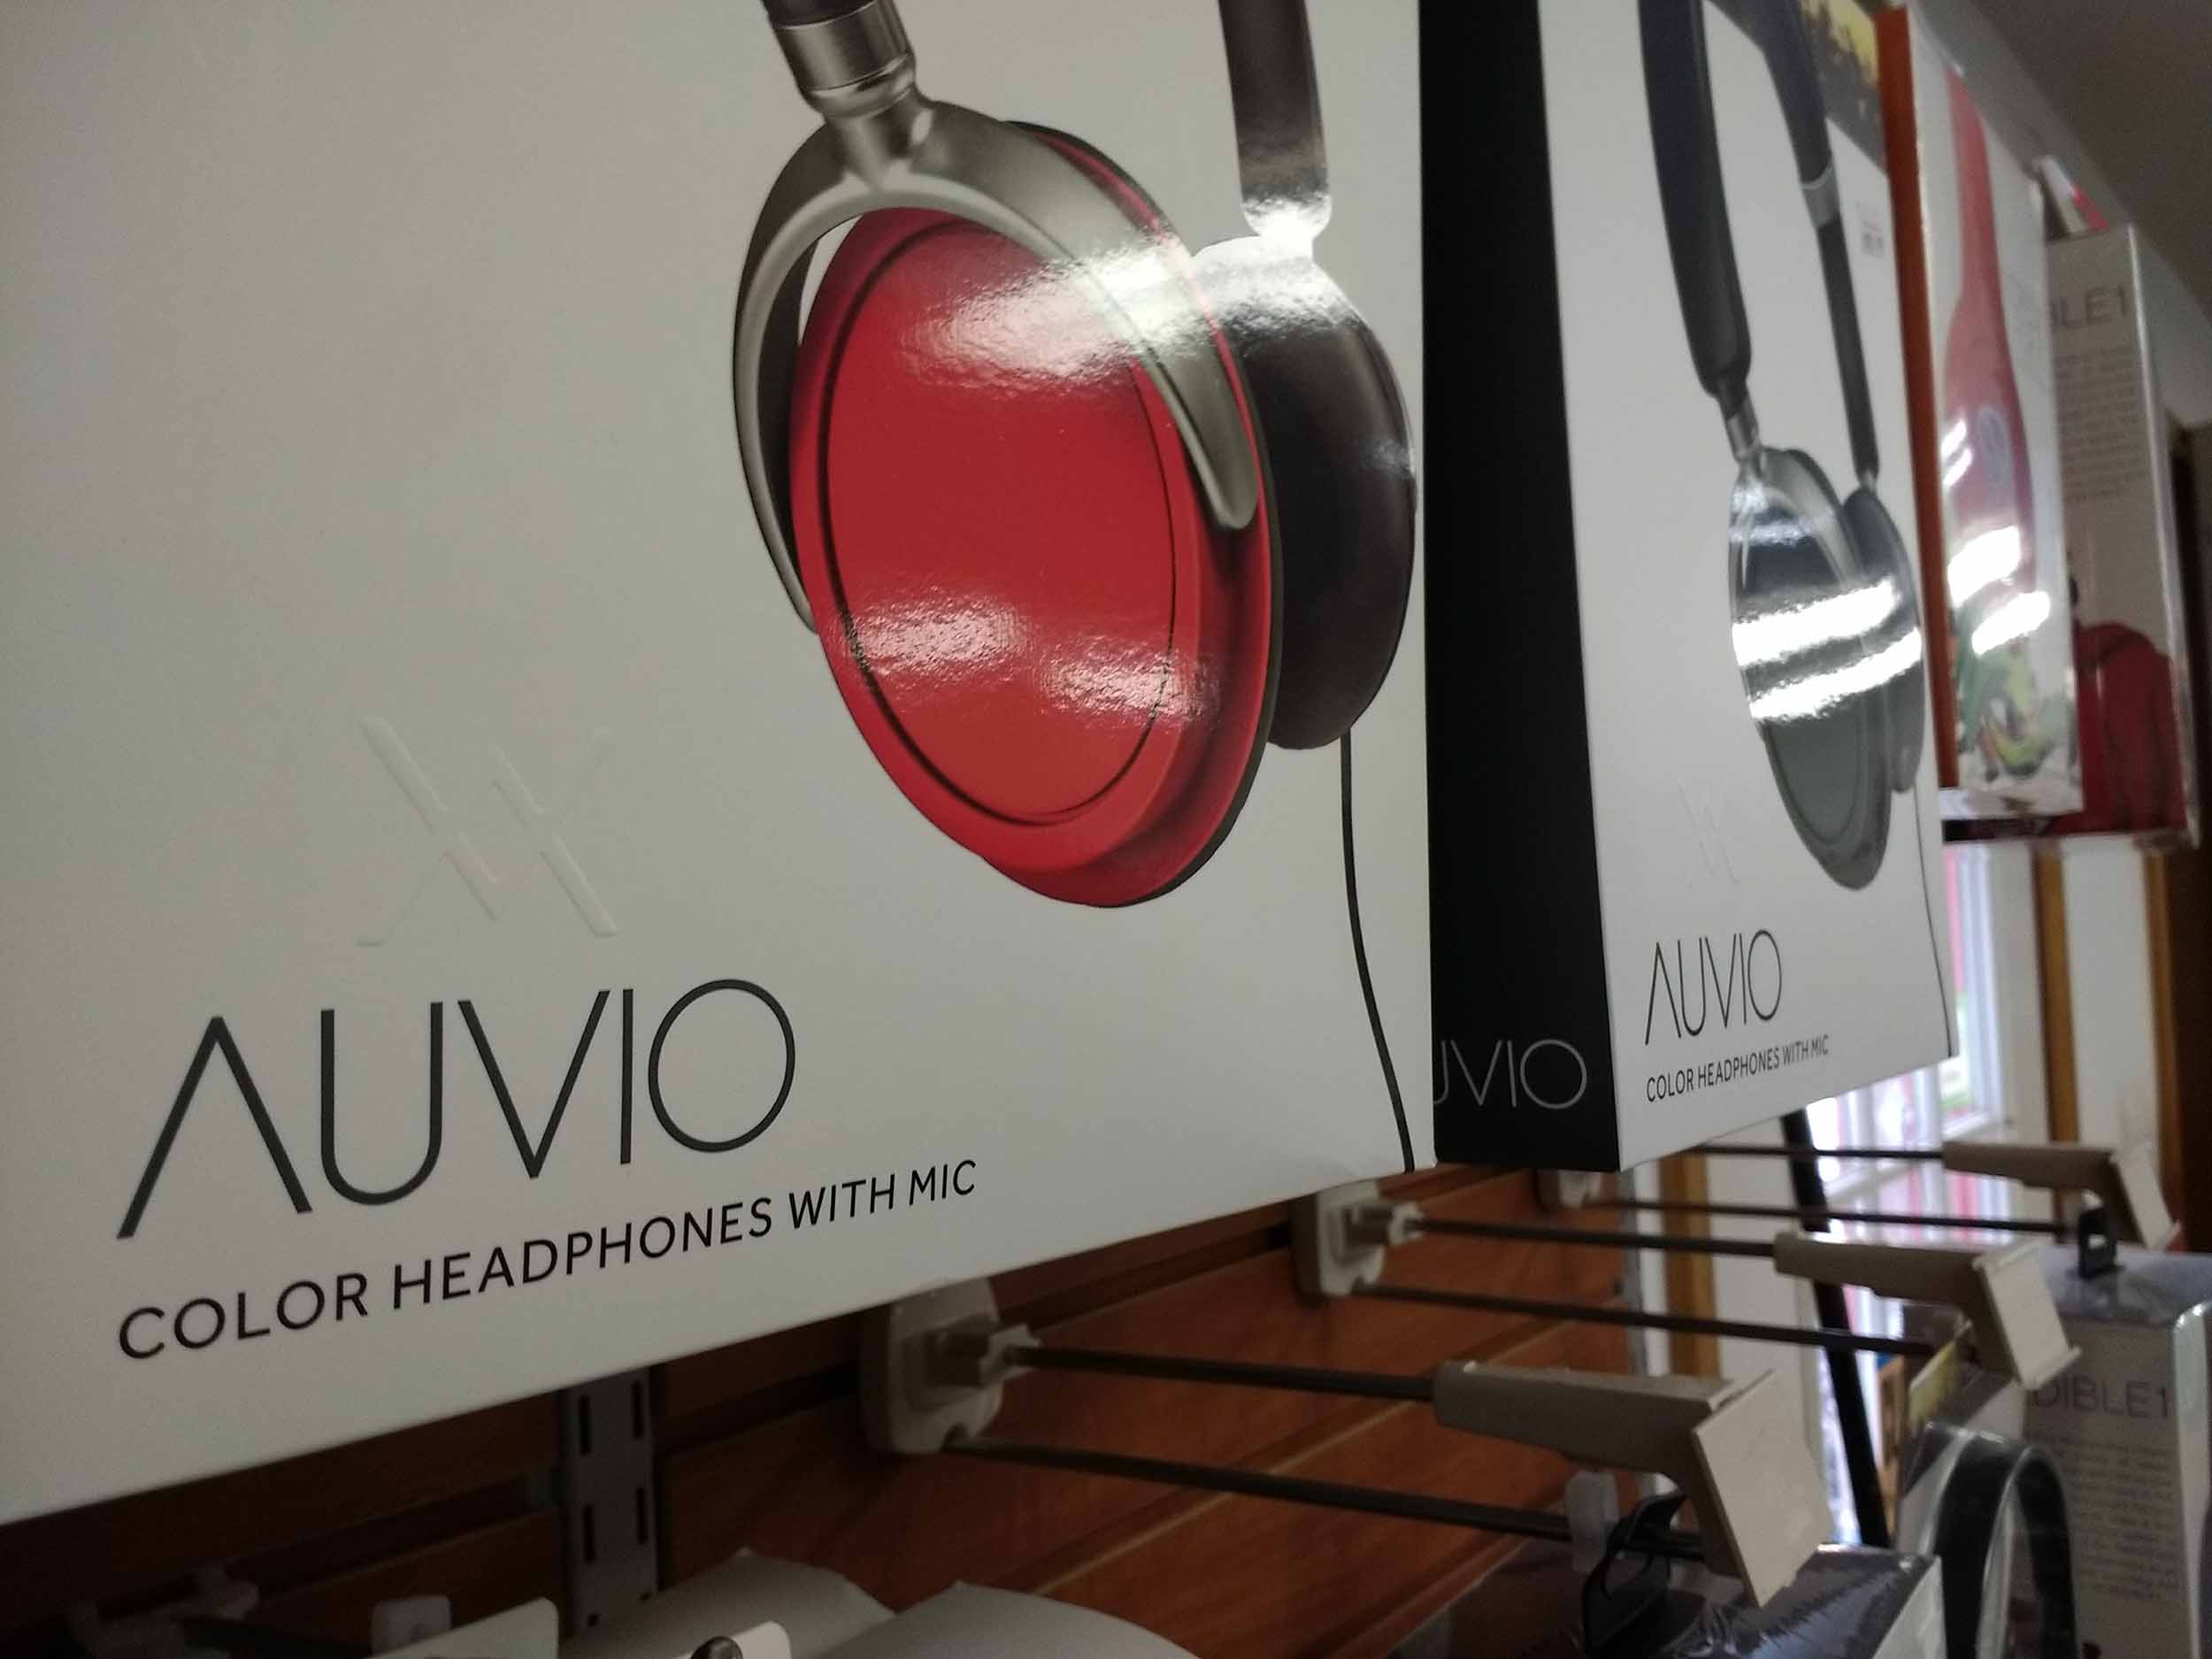 These Auvio brand headphones include mic.